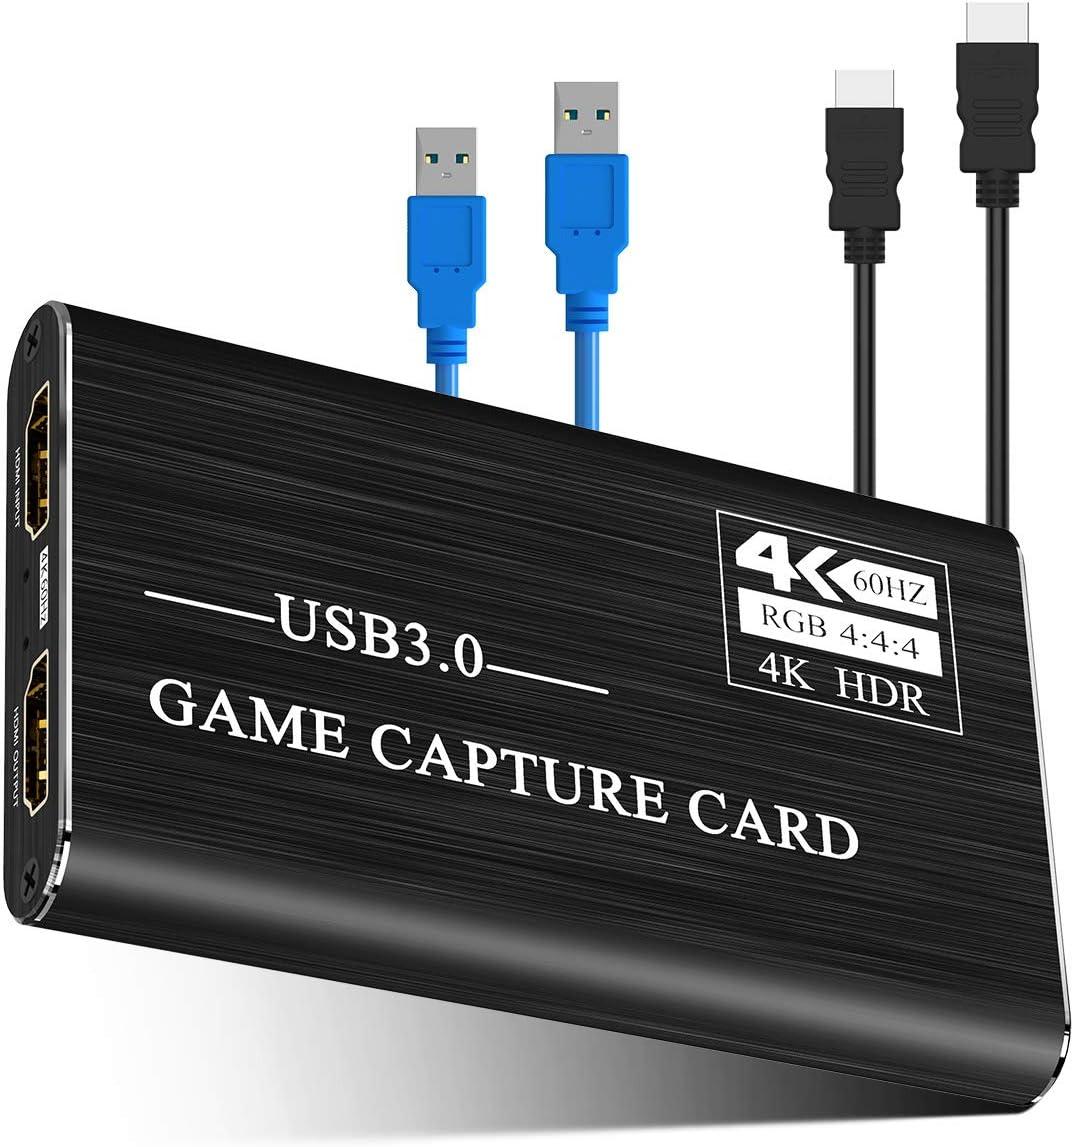 Viixm キャプチャーボード 4K HDMI